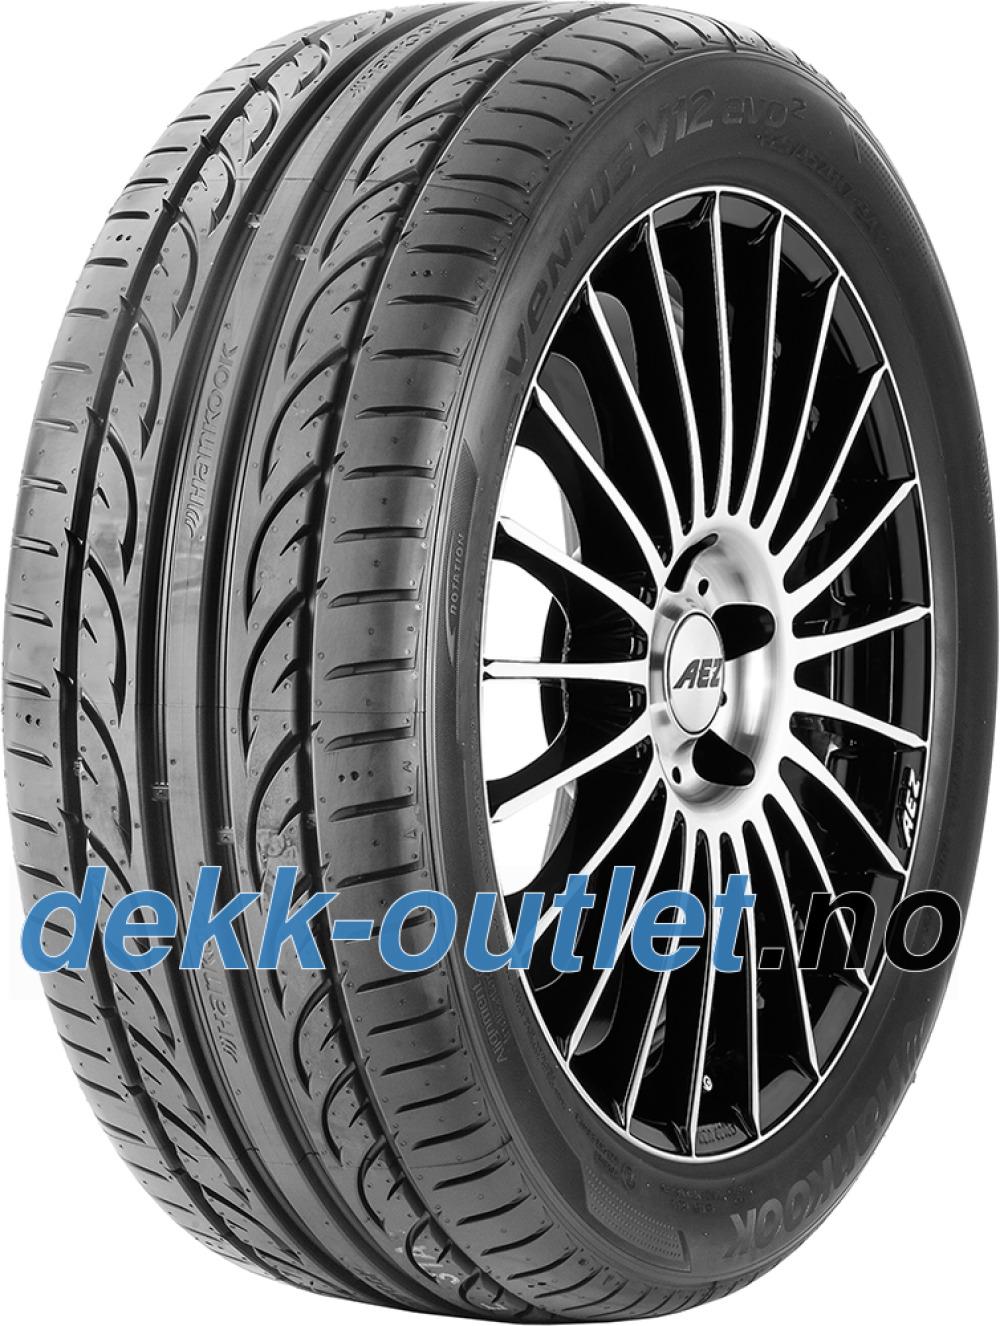 Hankook Ventus V12 Evo 2 K120 ( 245/35 ZR17 87Y med felgbeskyttelse (MFS) SBL )